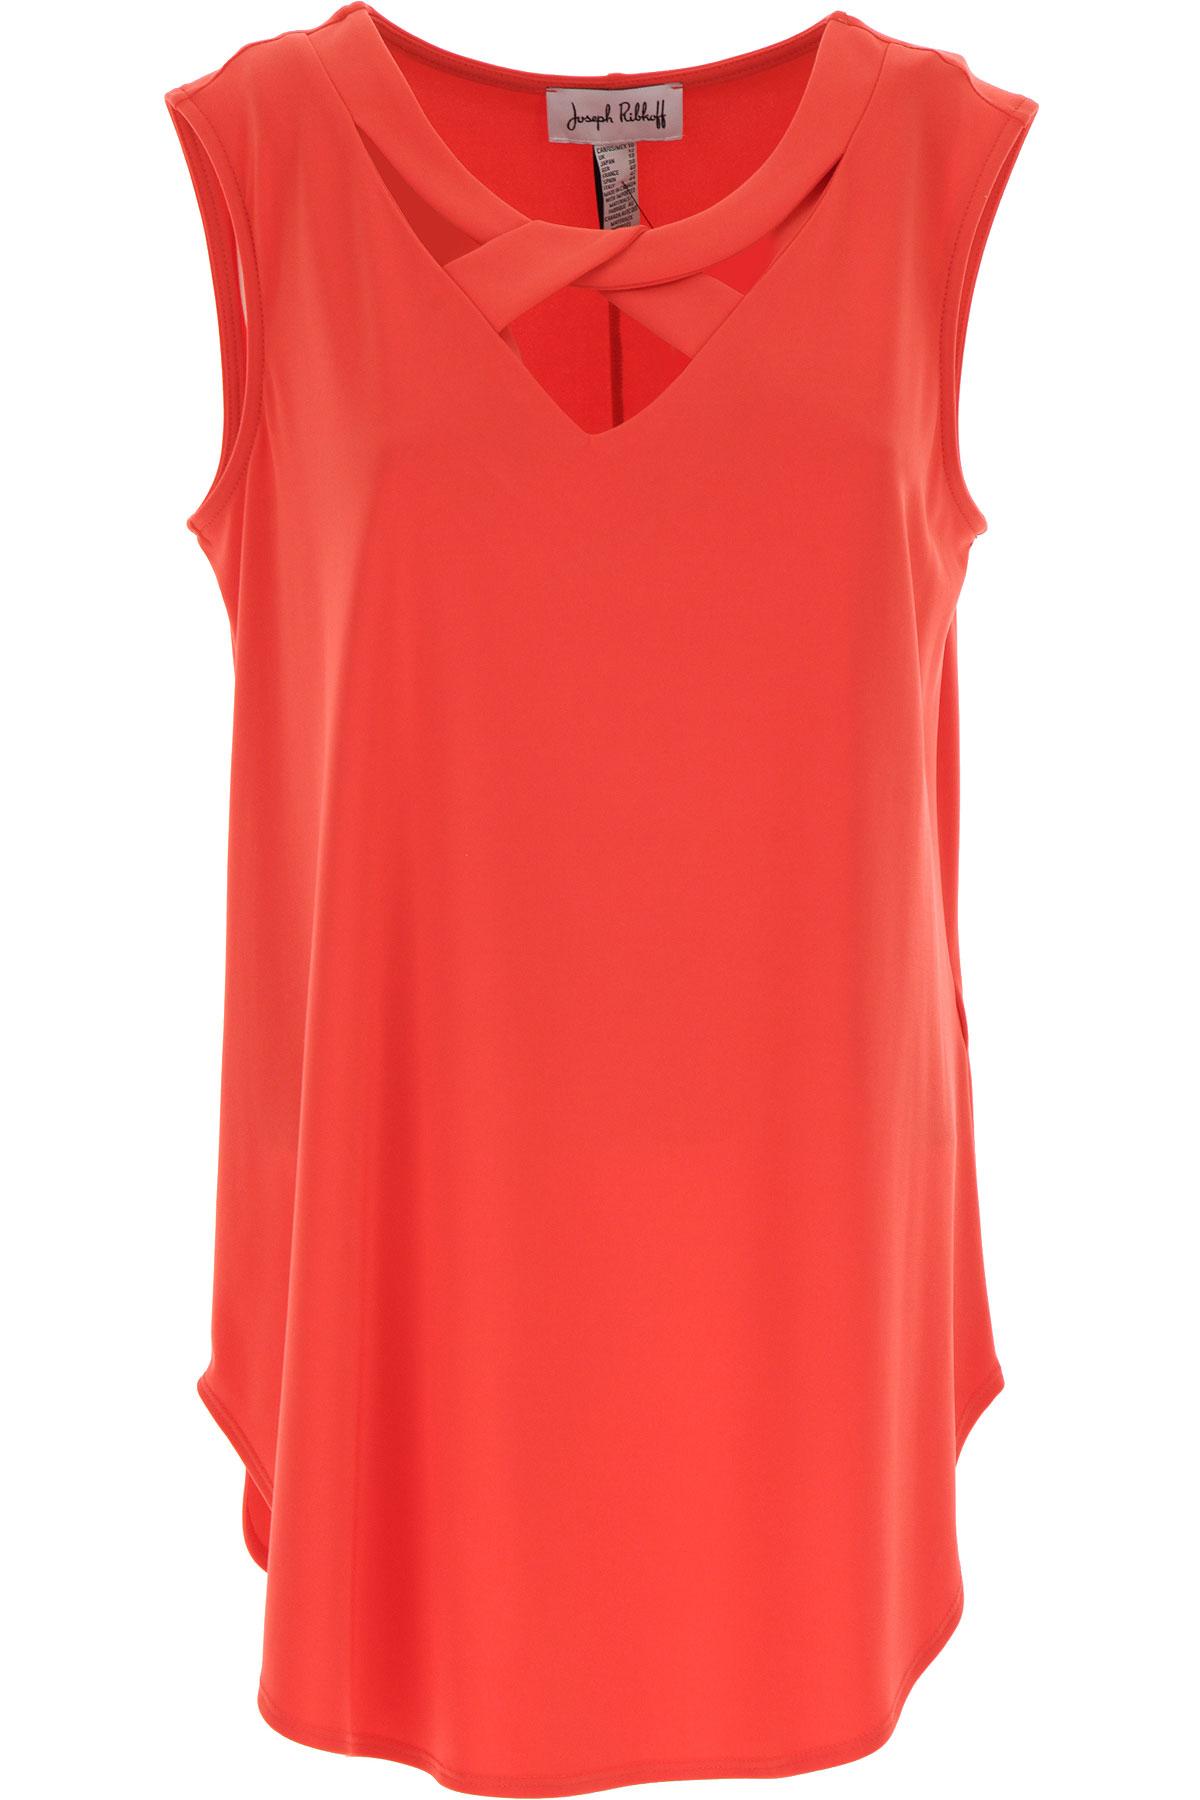 Joseph Ribkoff Top for Women On Sale, Orange, polyester, 2019, 10 12 14 8